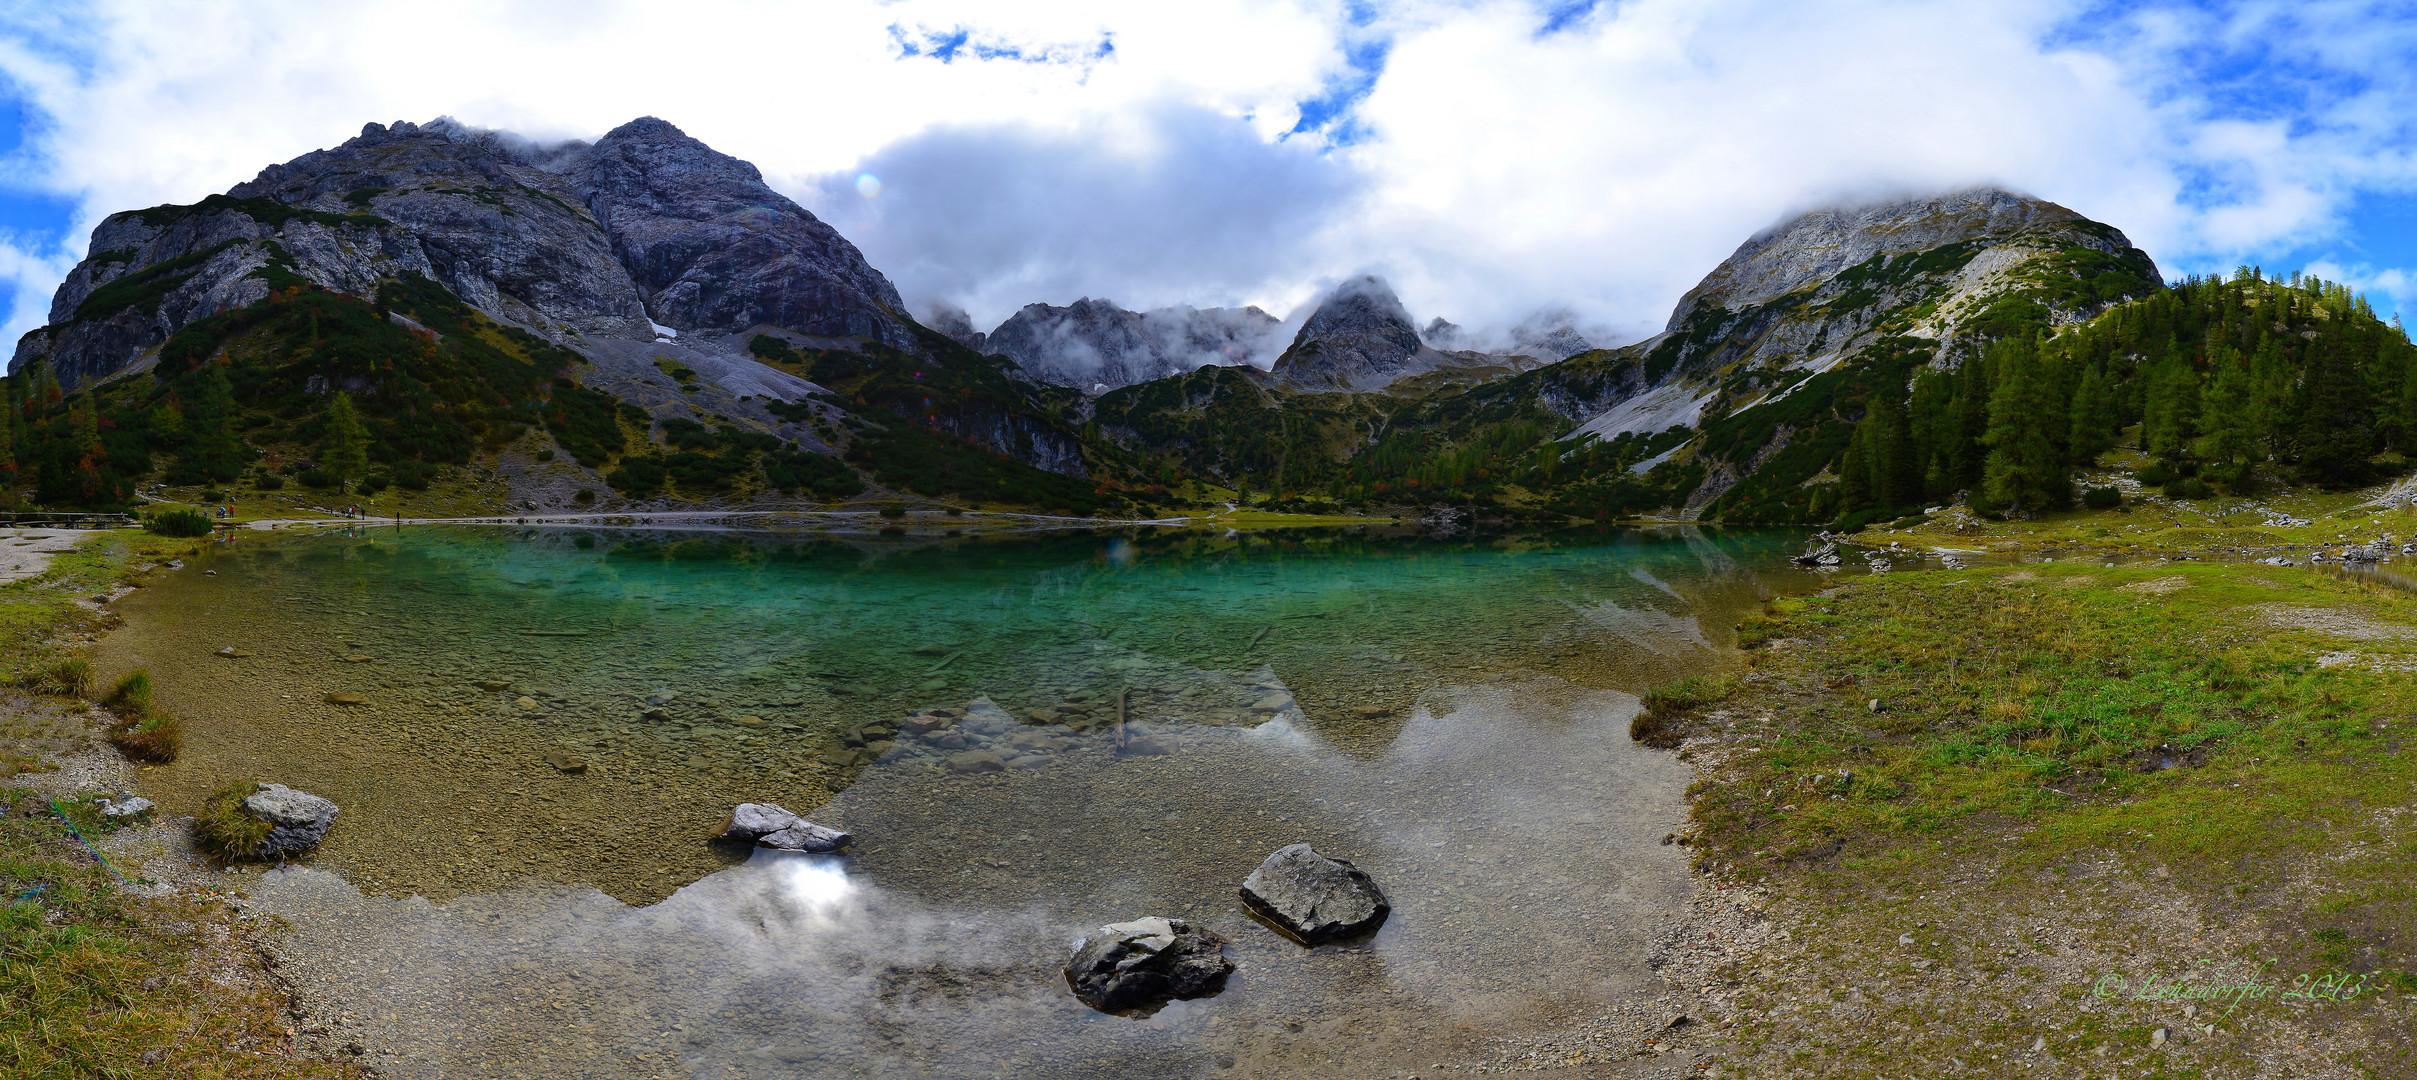 Am Seebensee in Tirol